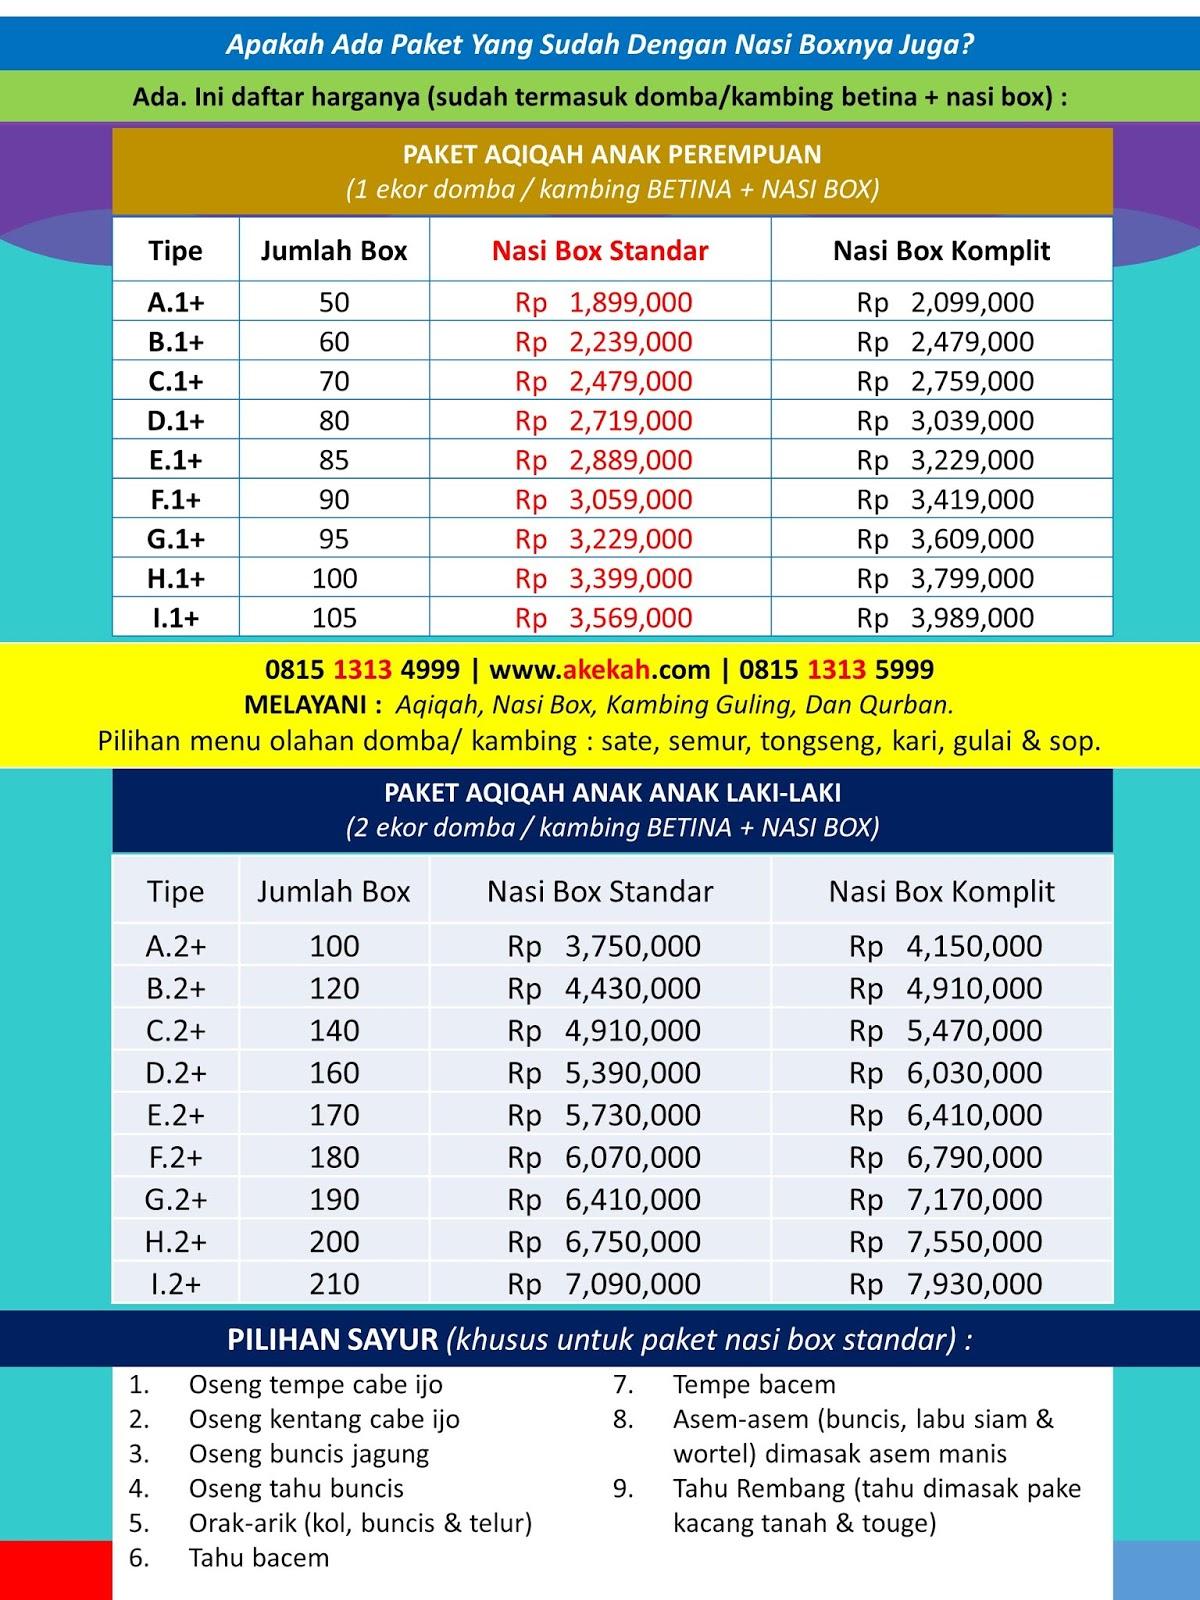 Harga Aqiqah & Catering Untuk Perempuan Di Daerah Kecamatan Sukaraja Bogor